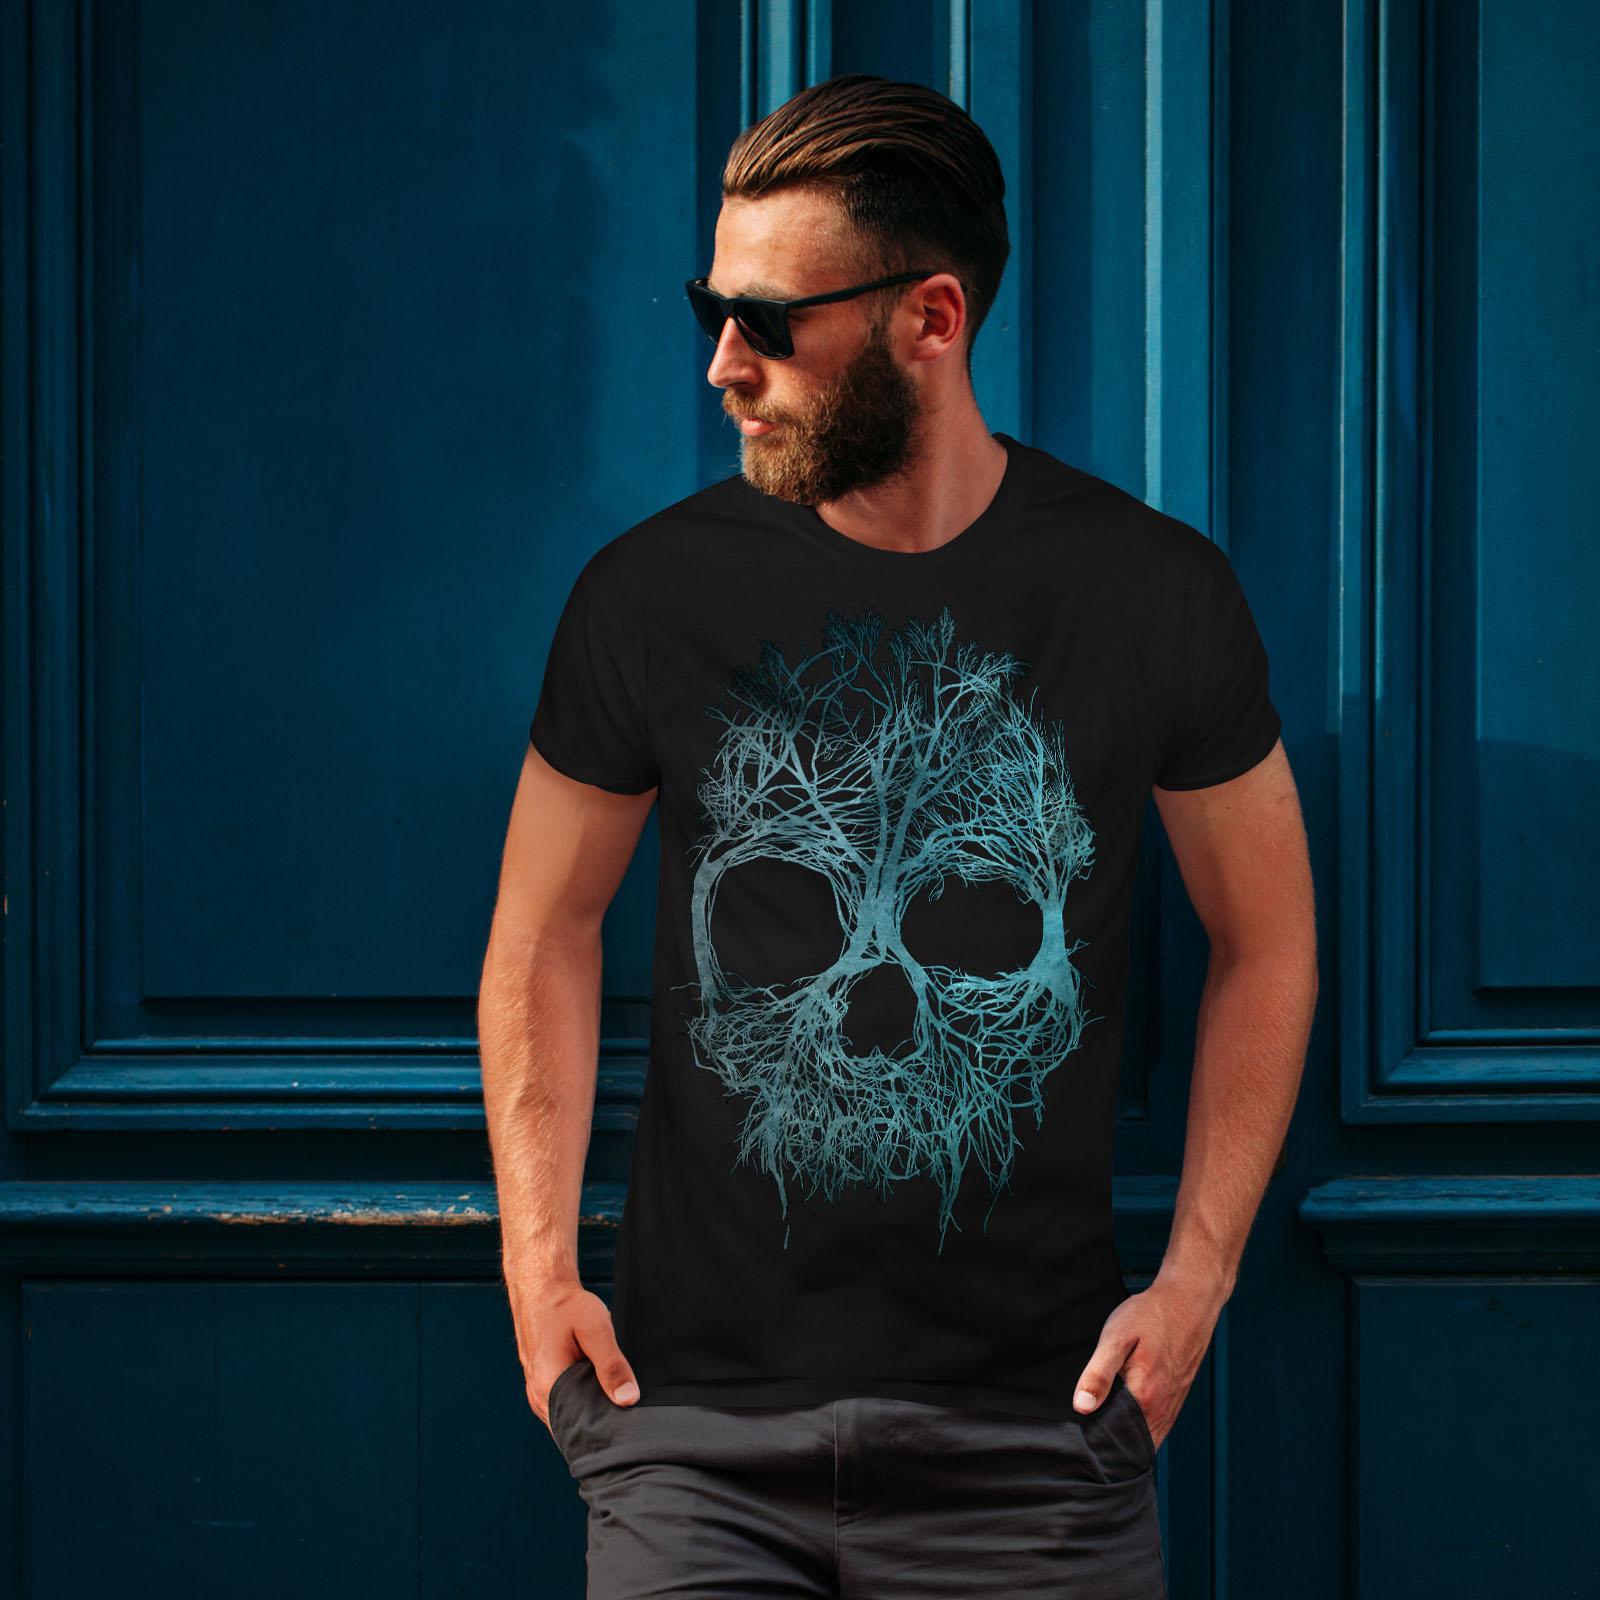 Wellcoda Nature Tree Metal Skull Mens T-shirt Angel Graphic Design Printed Tee